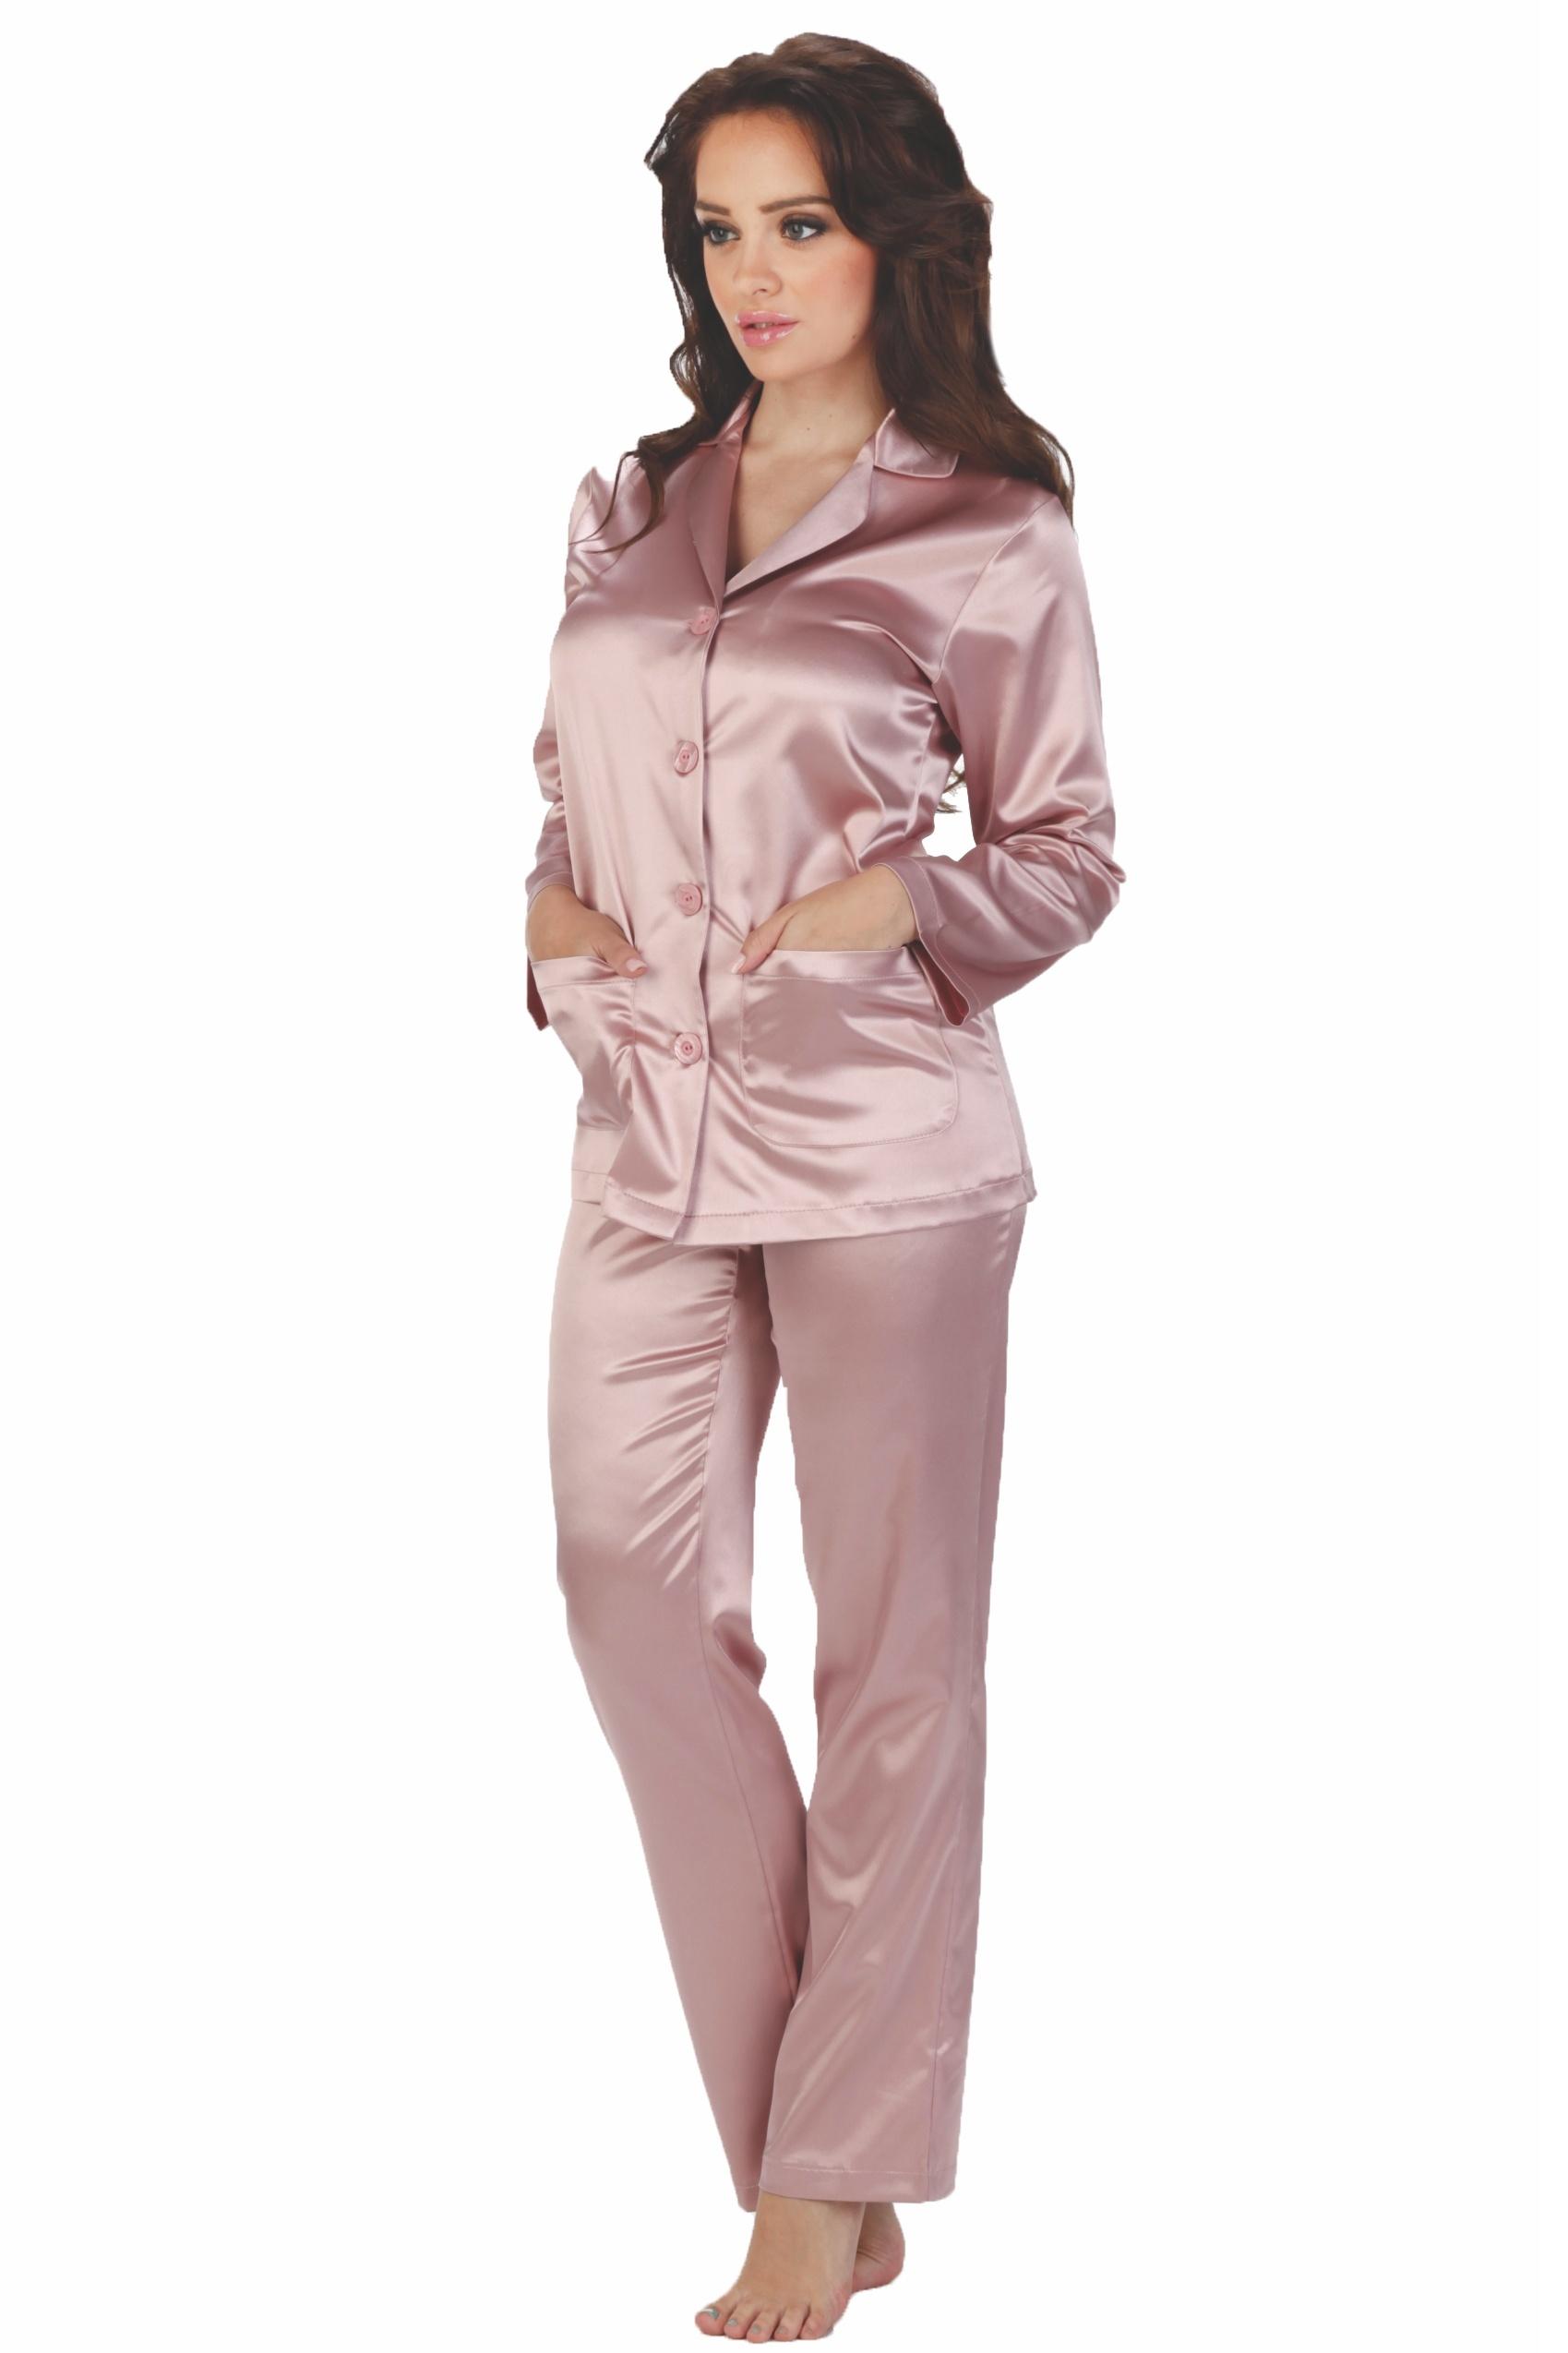 1a40446846af Dámské růžové saténové pyžamo Classic dlouhé - ELEGANT.cz